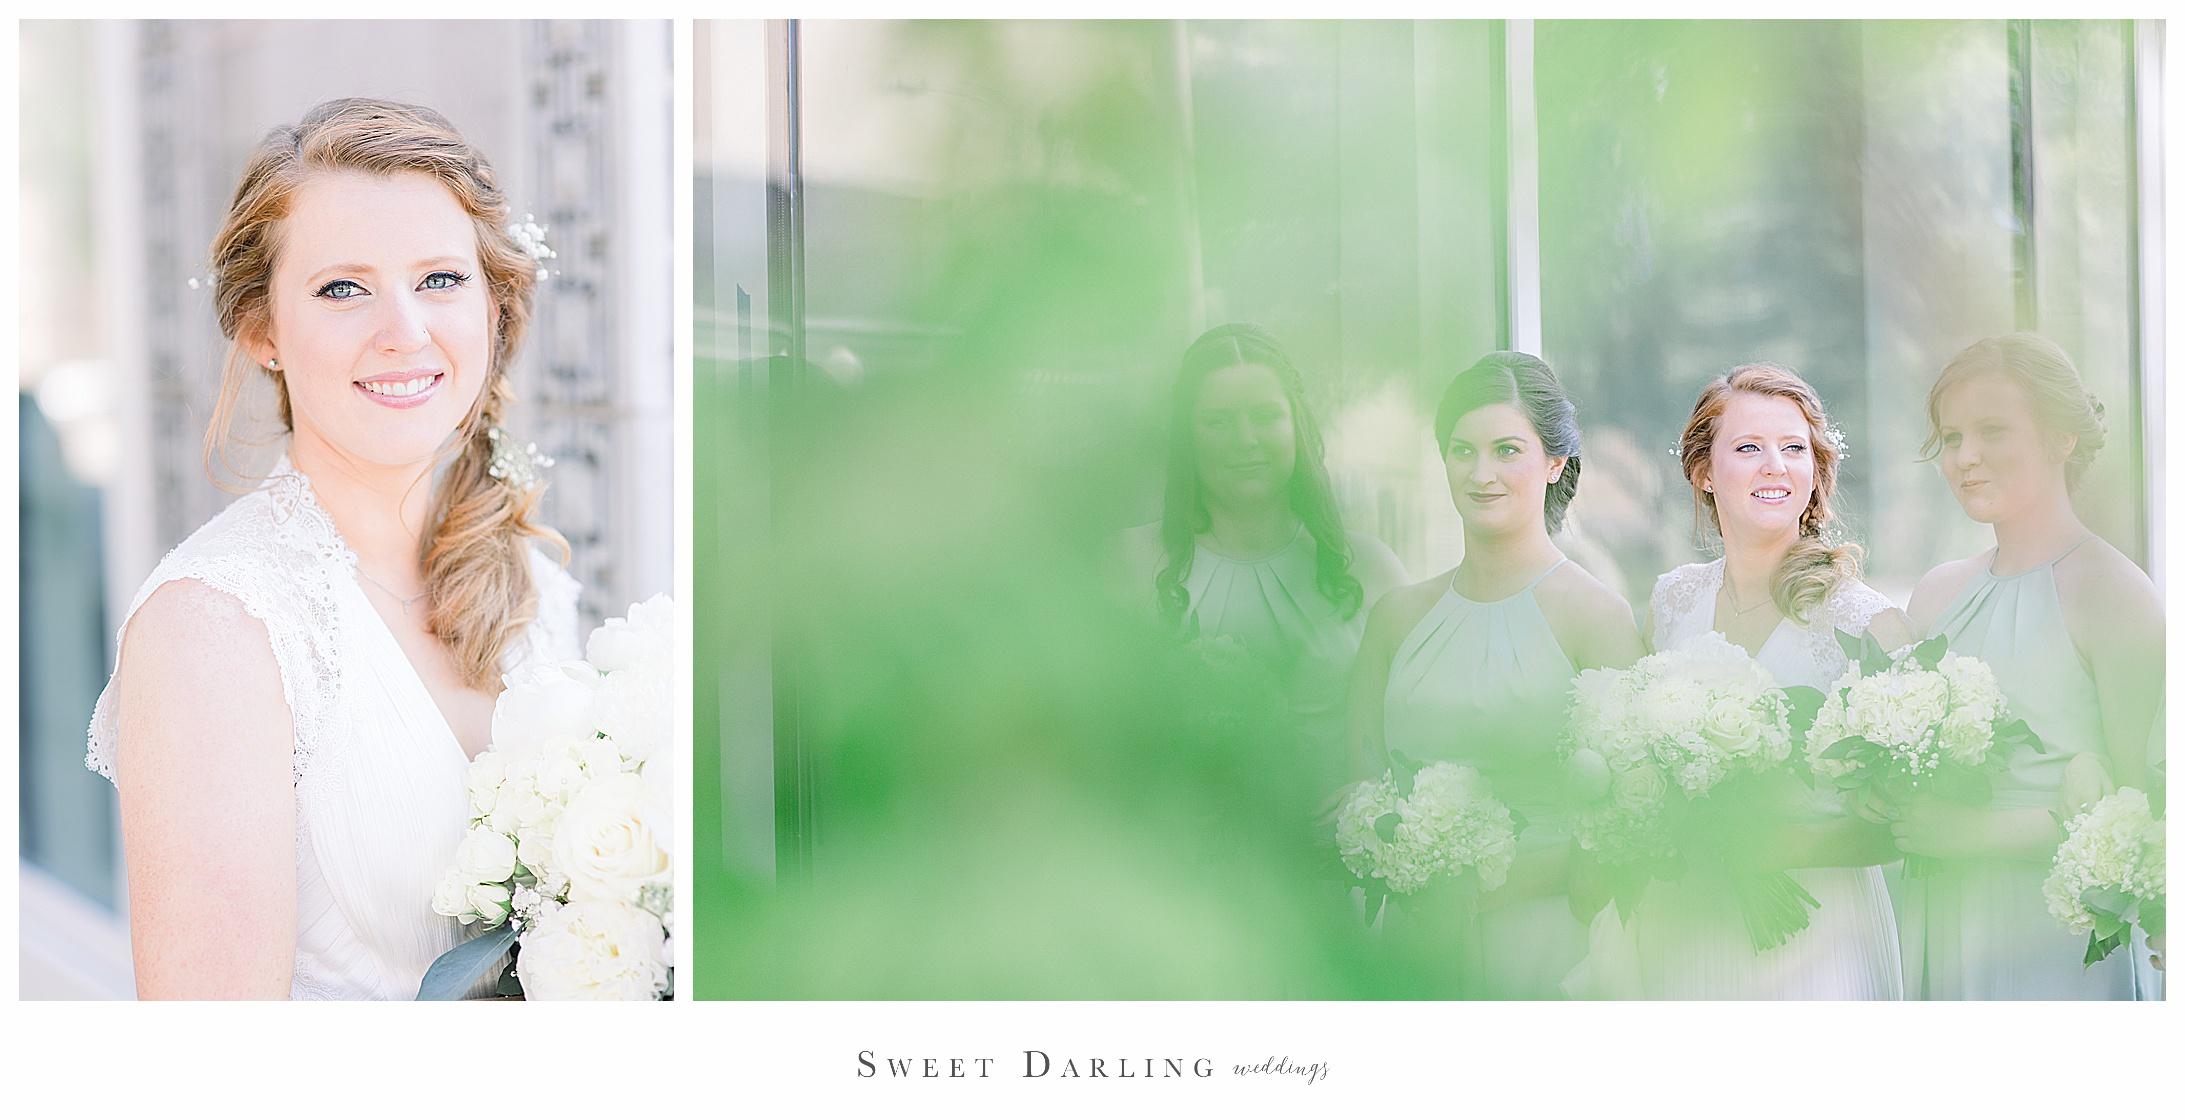 champaign-illinois-boho-summer-wedding-photographer-city-center-sweet-darling-weddings_2328.jpg